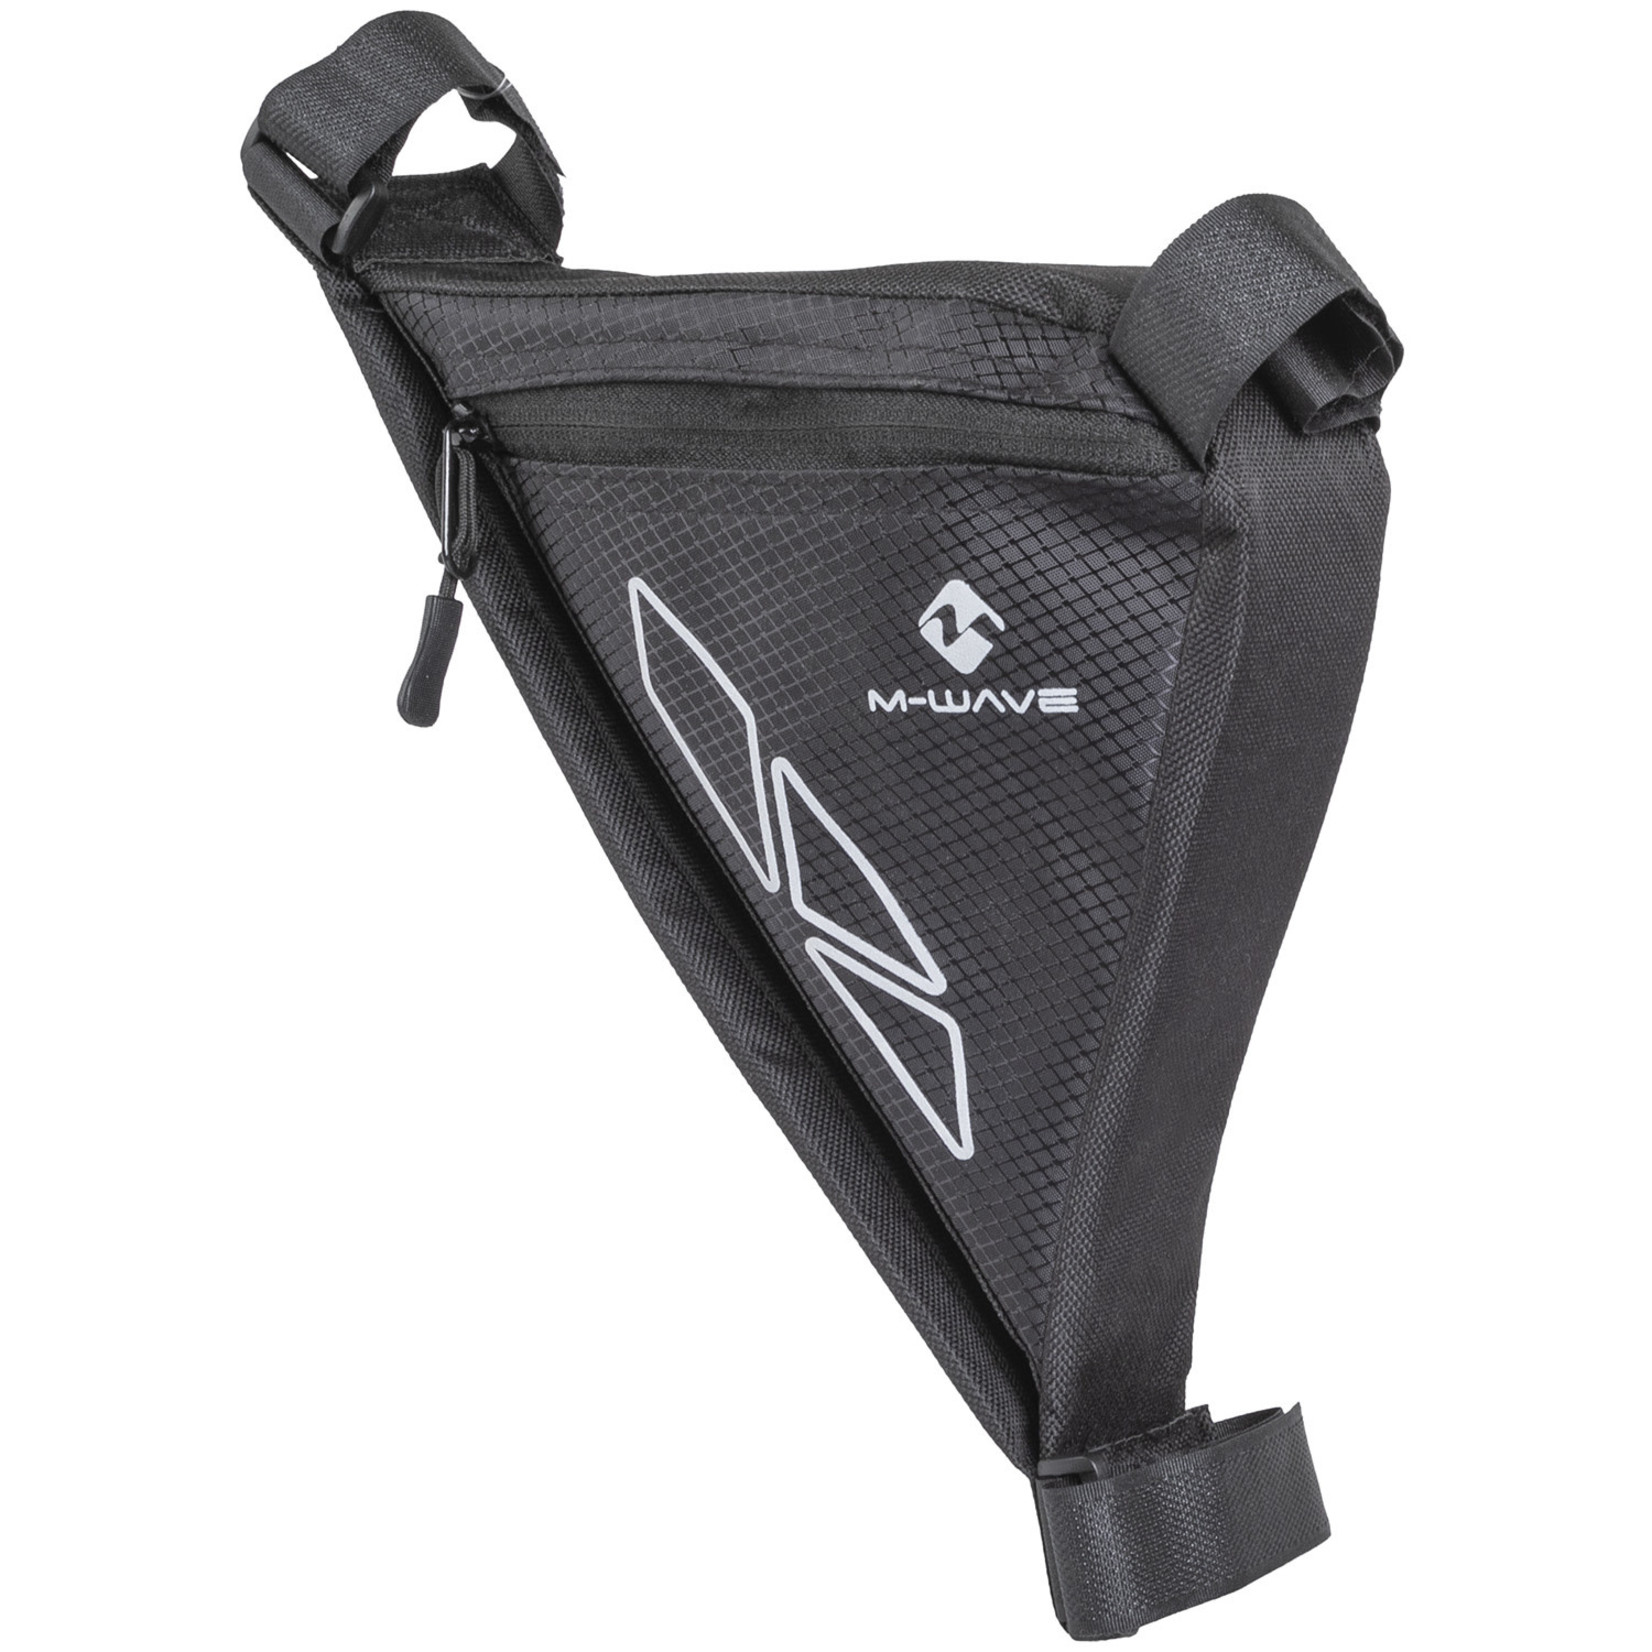 M-Wave Triangle Frame Bag